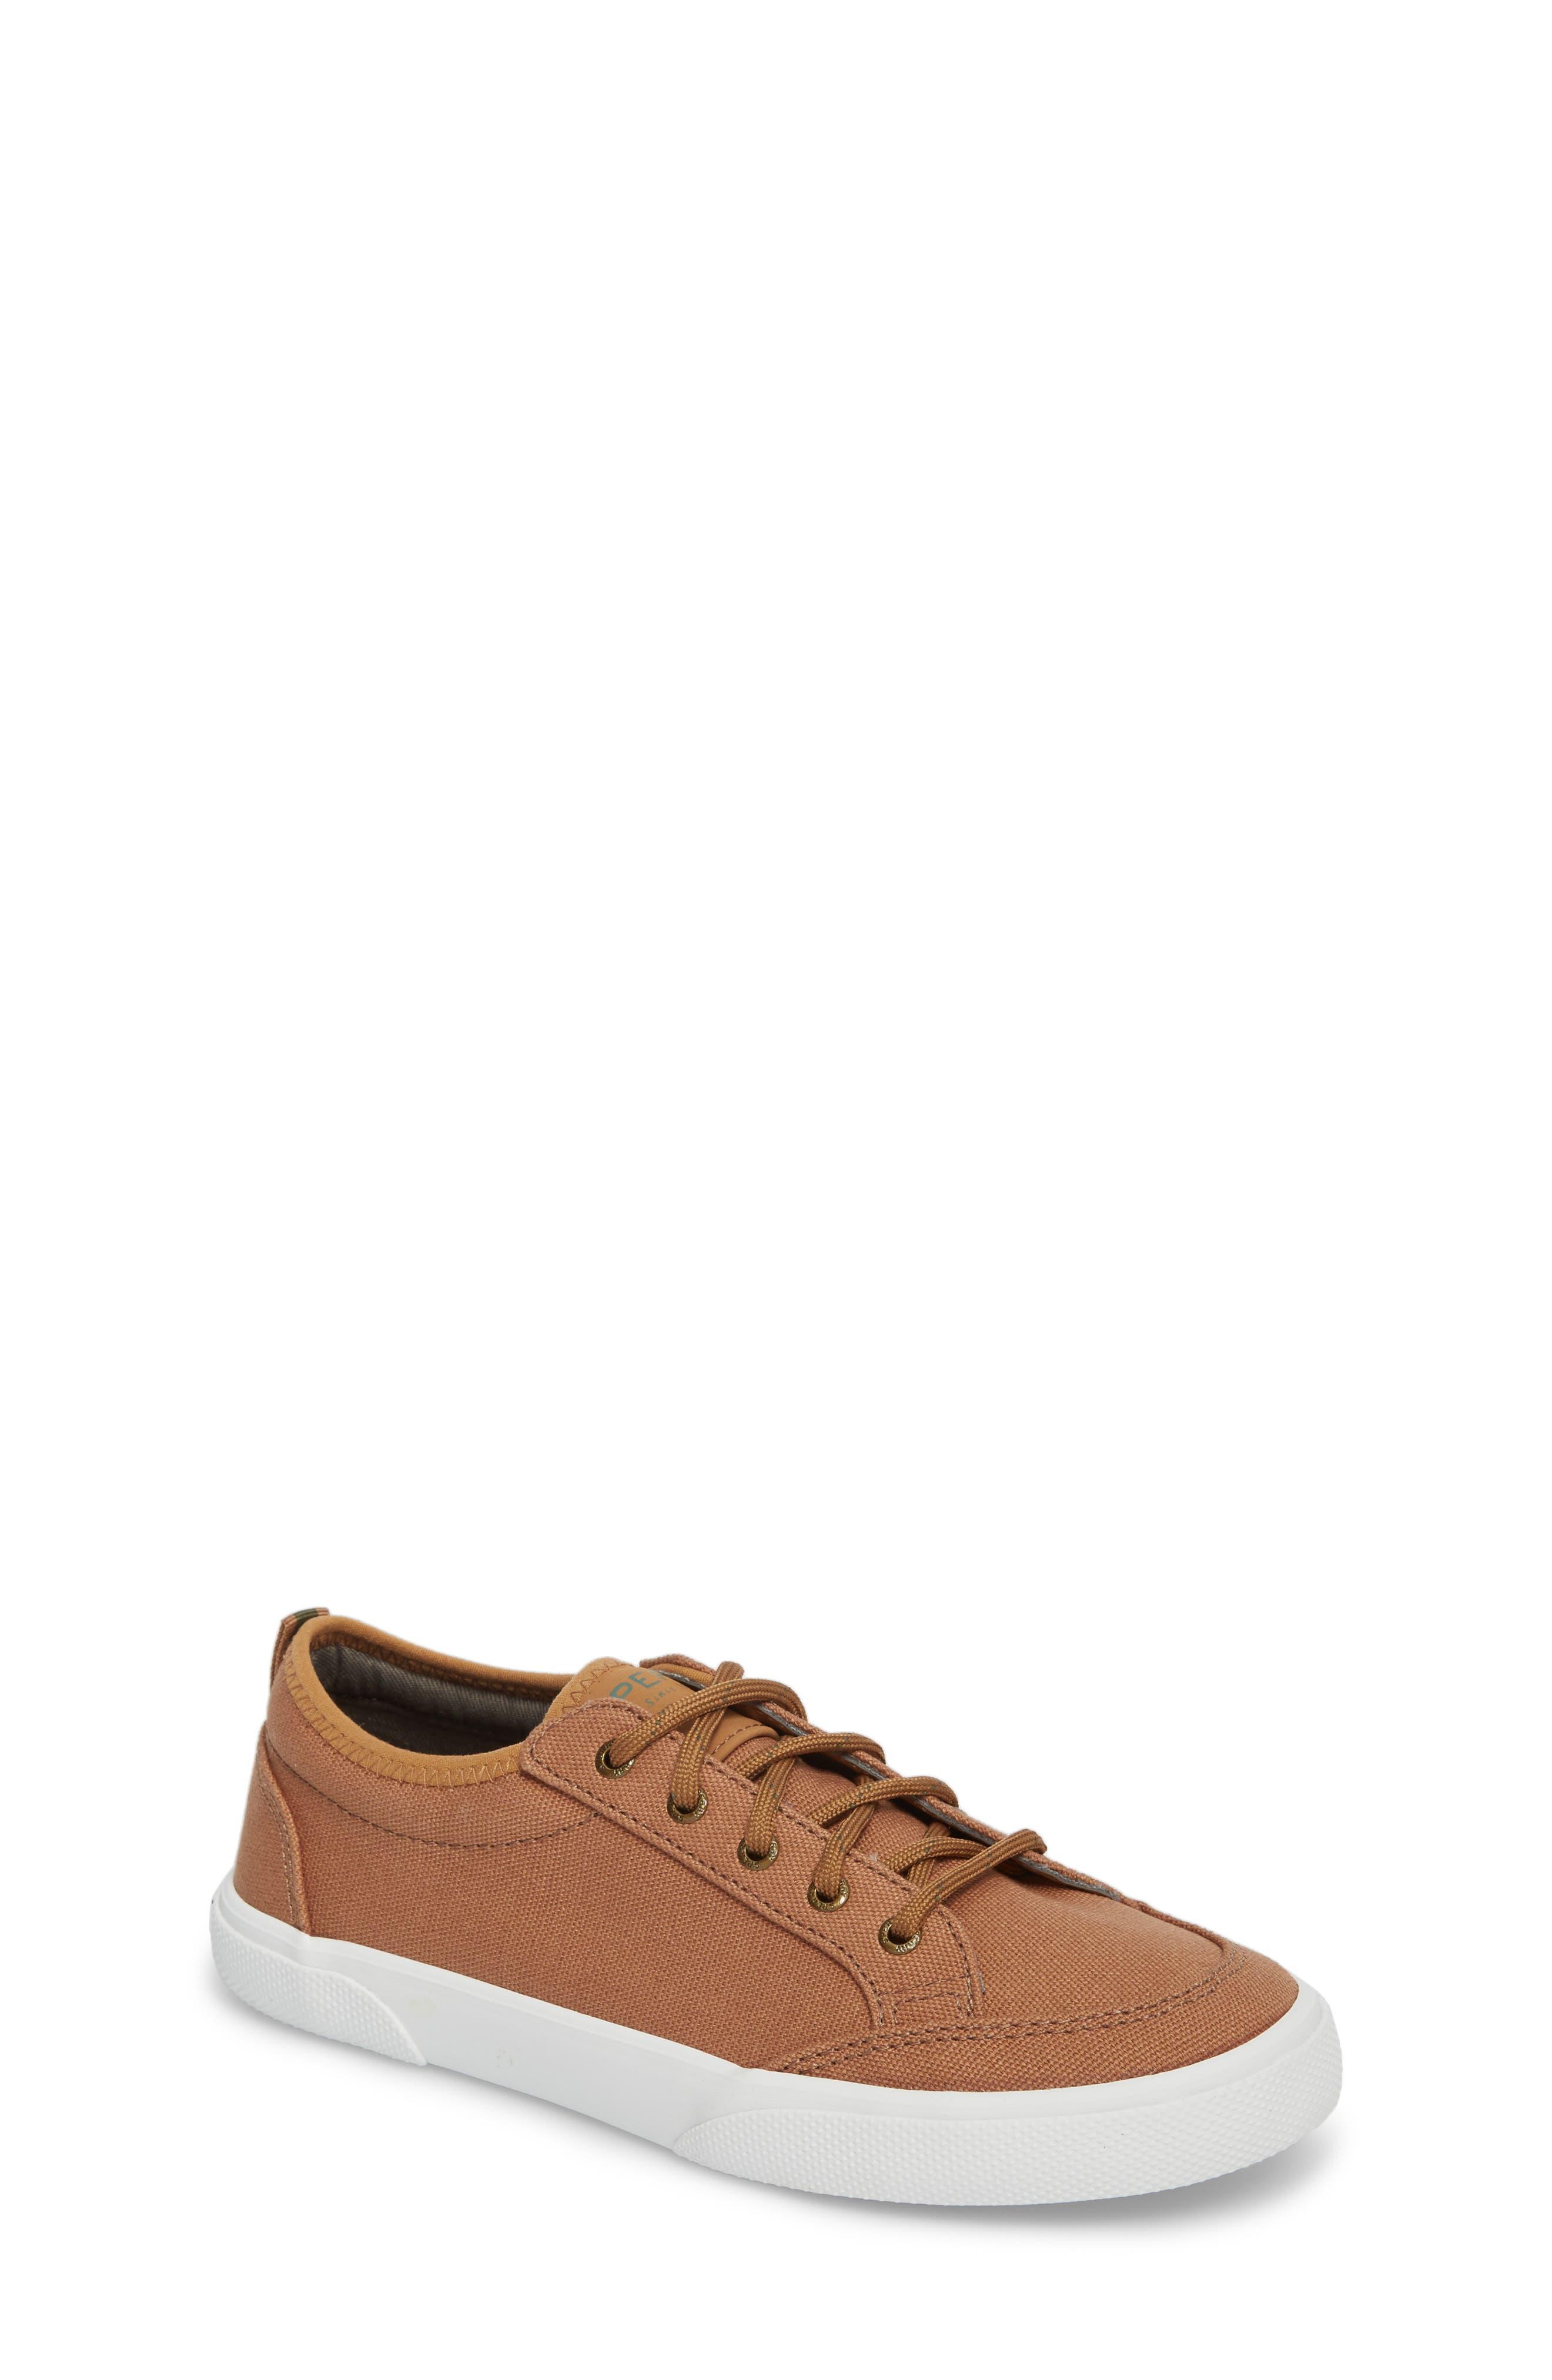 Sperry Deckfin Sneaker,                         Main,                         color, Caramel